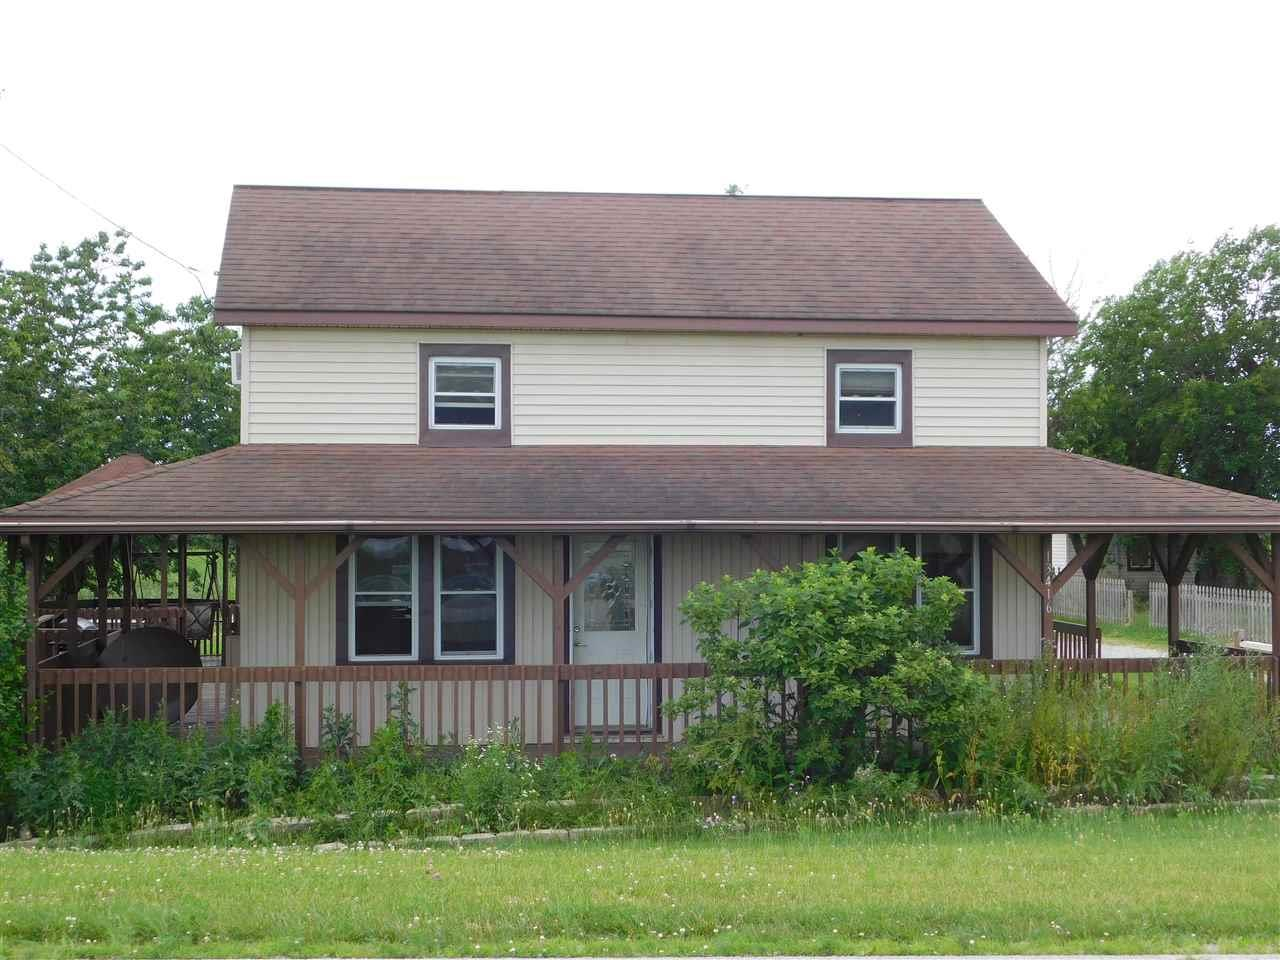 13416 Thiele, Fort Wayne, IN 46819